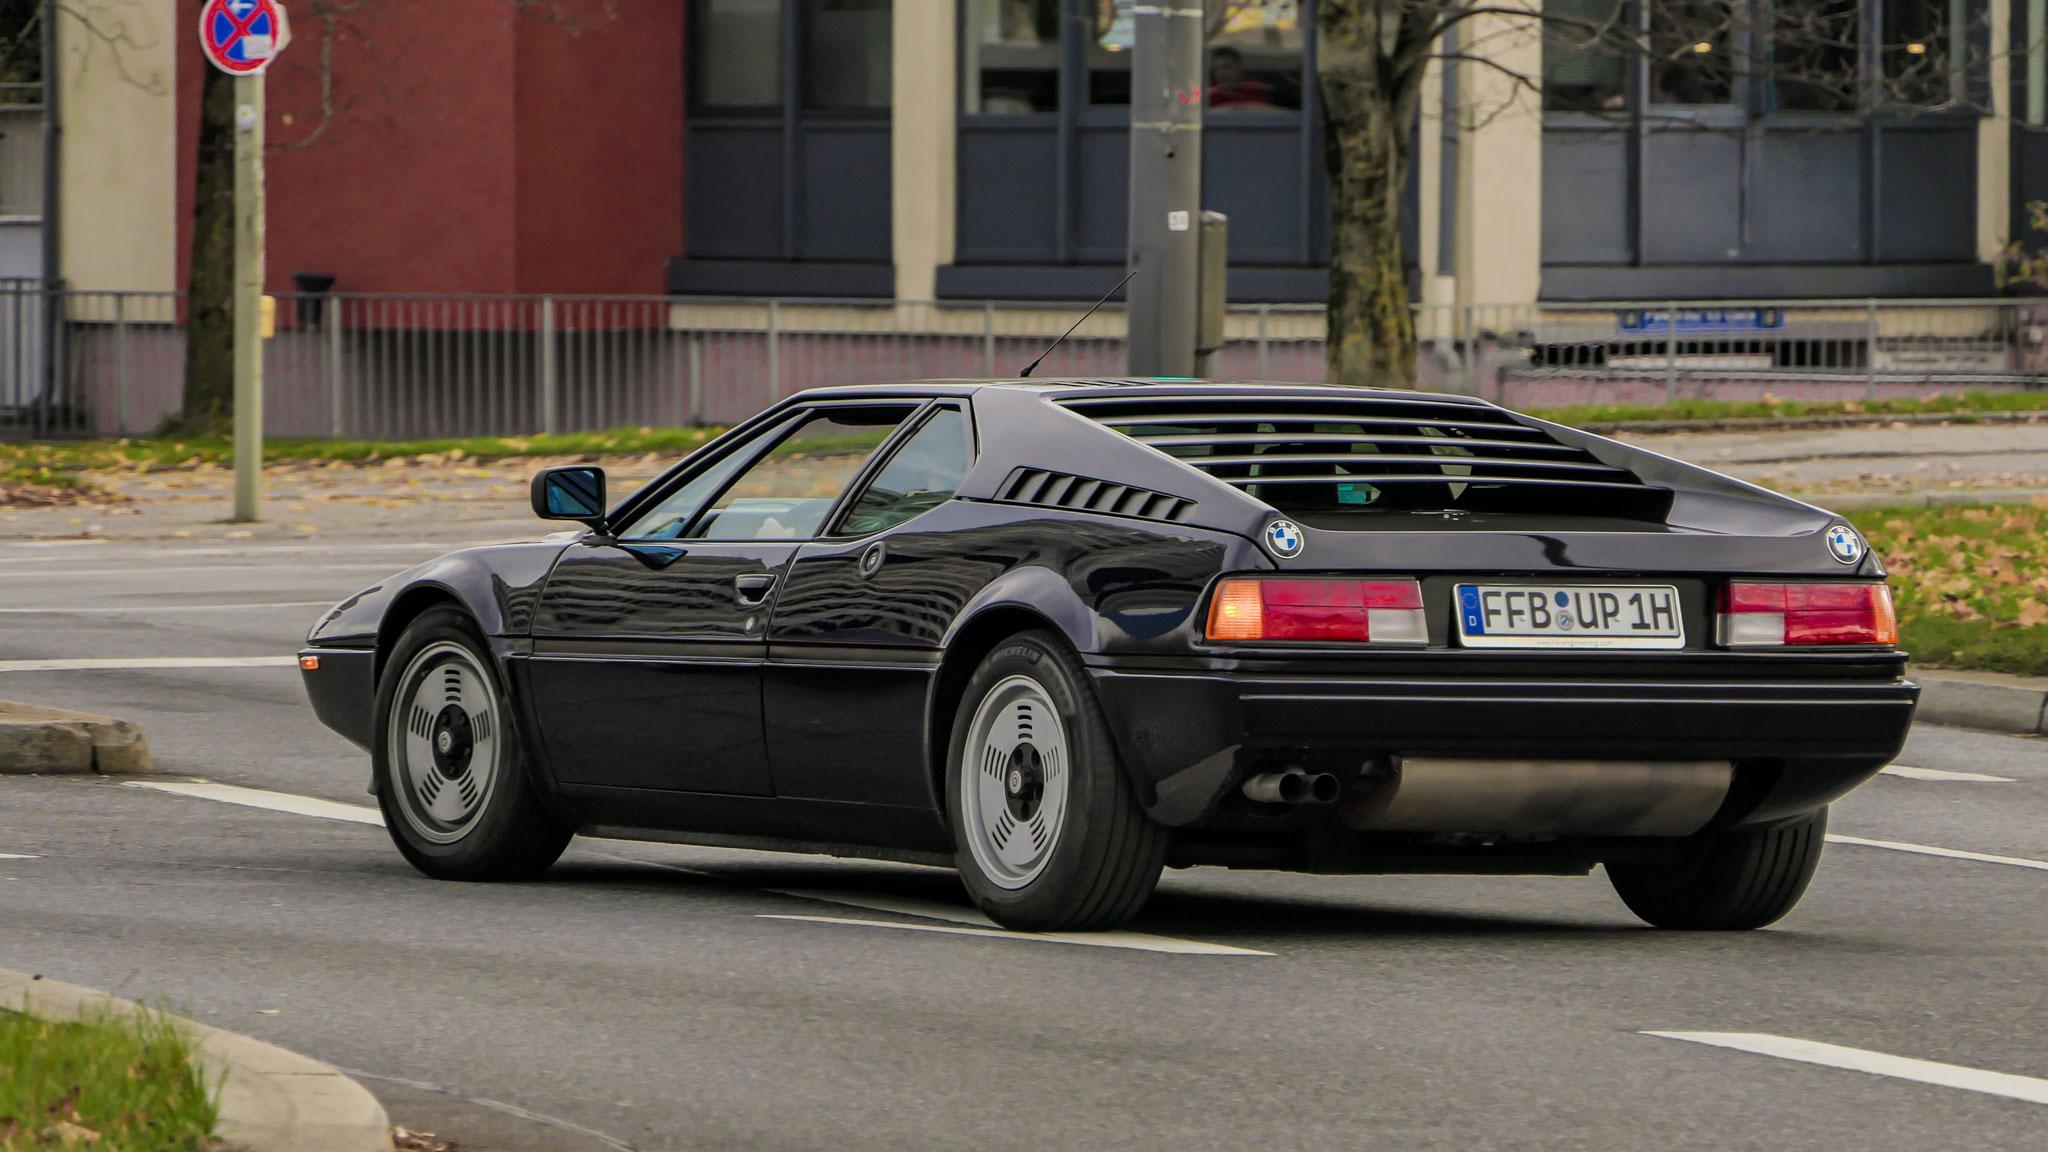 BMW M1 - FFB-UP-1H